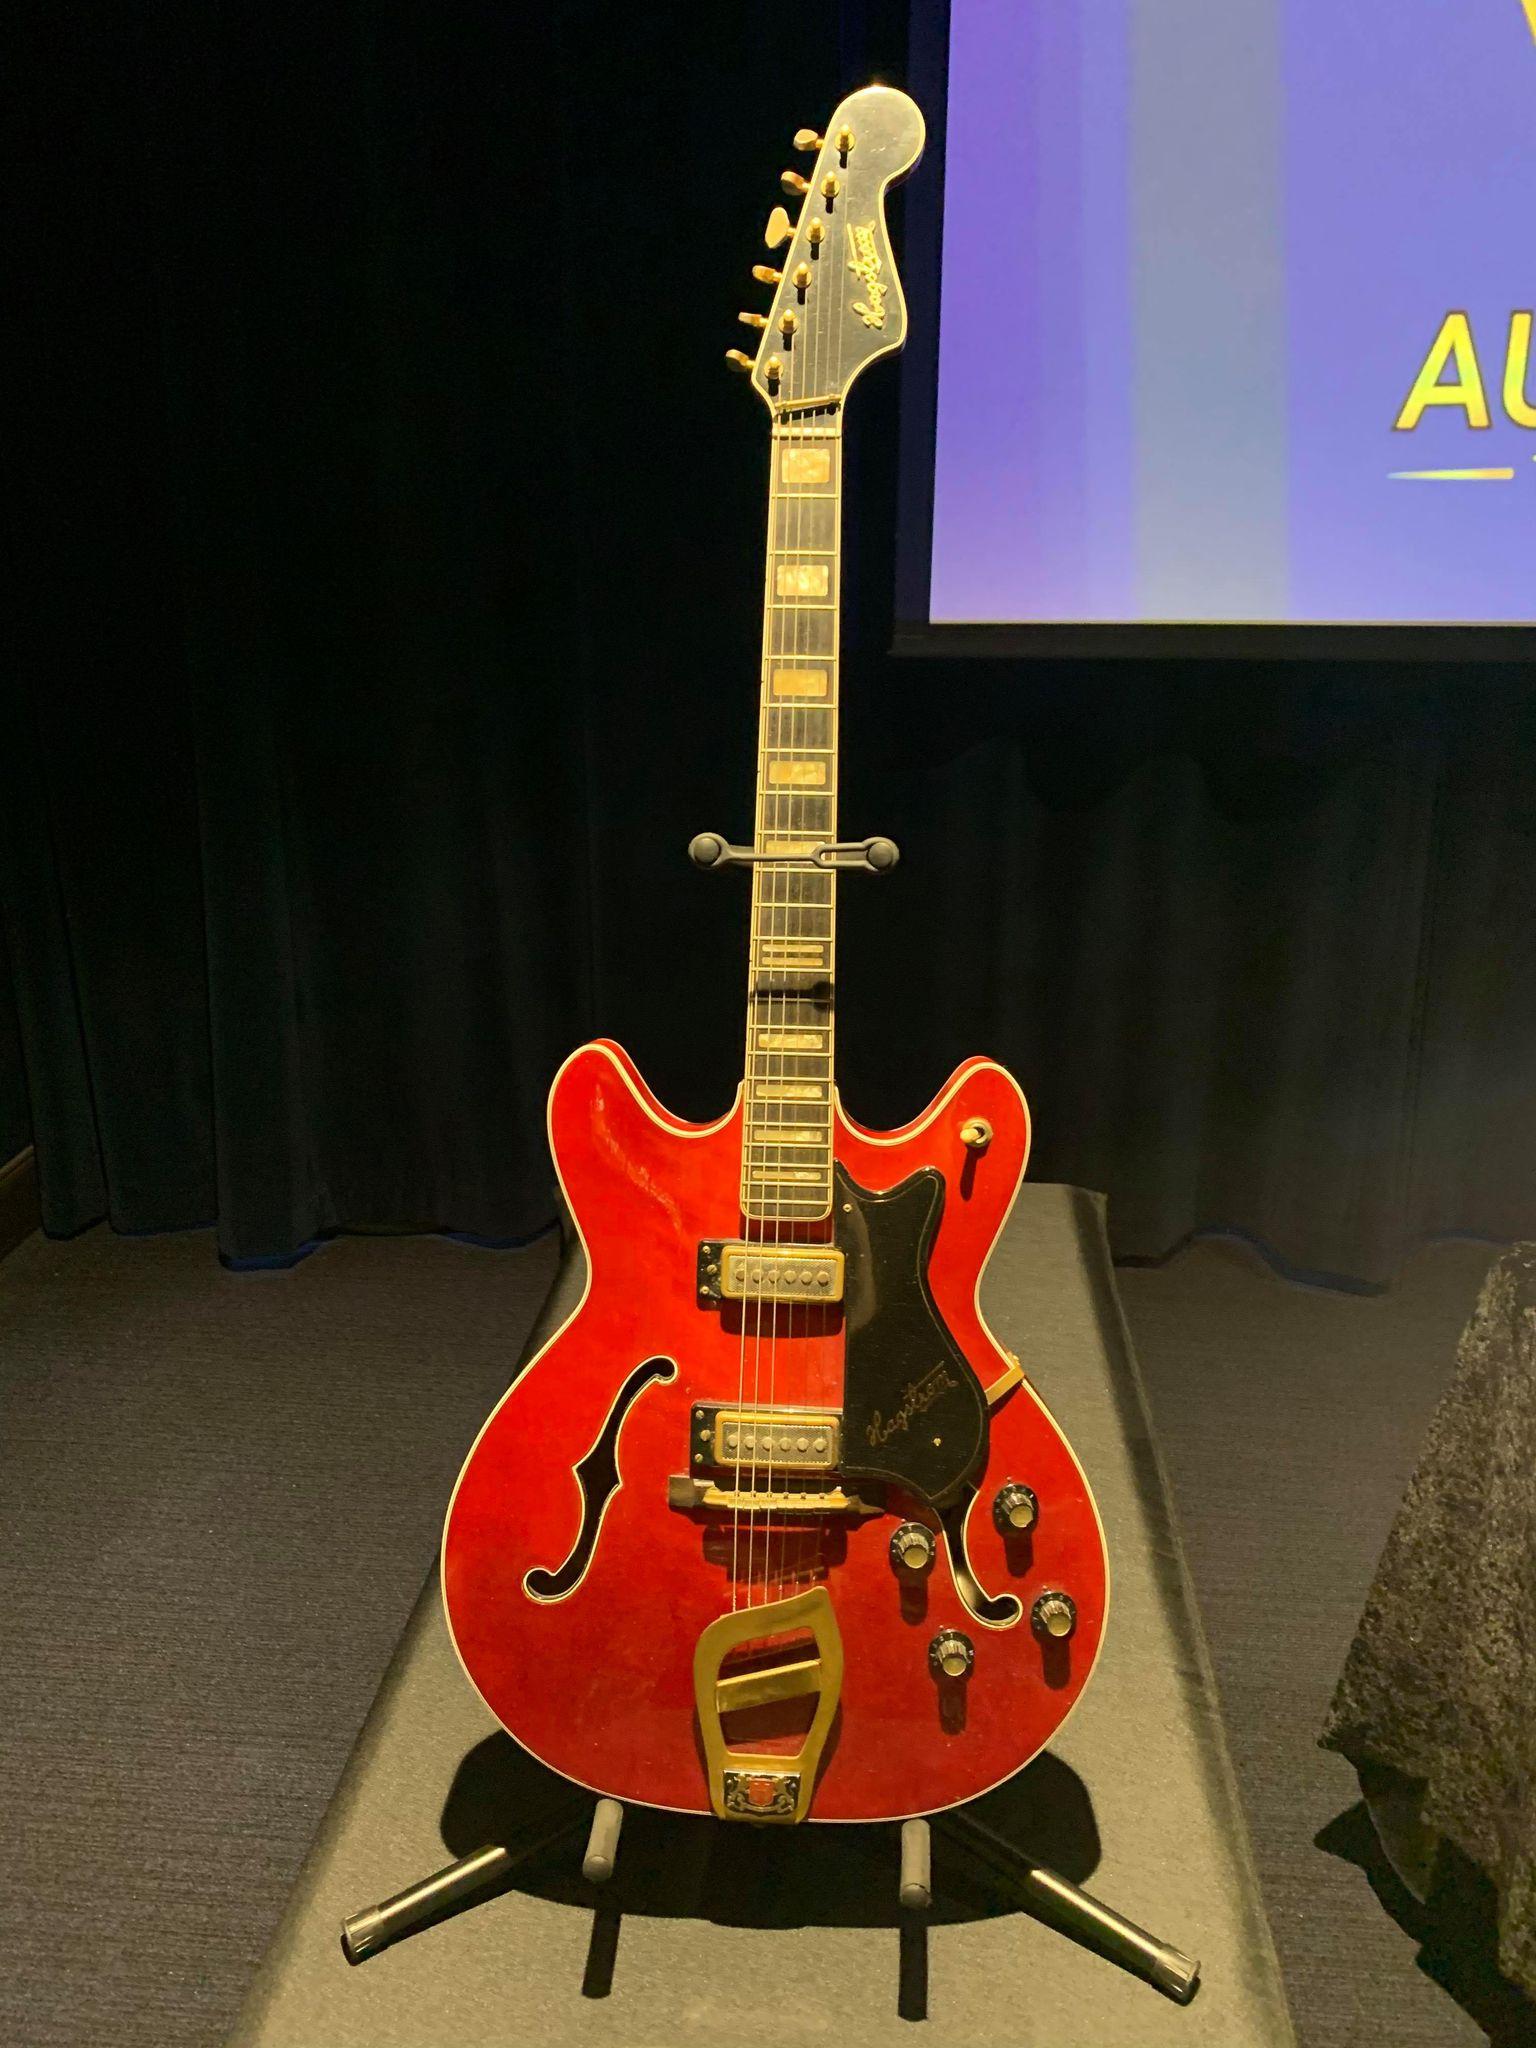 Kruse GWS Auctions: Elvis Presley Comeback TV Special guitar